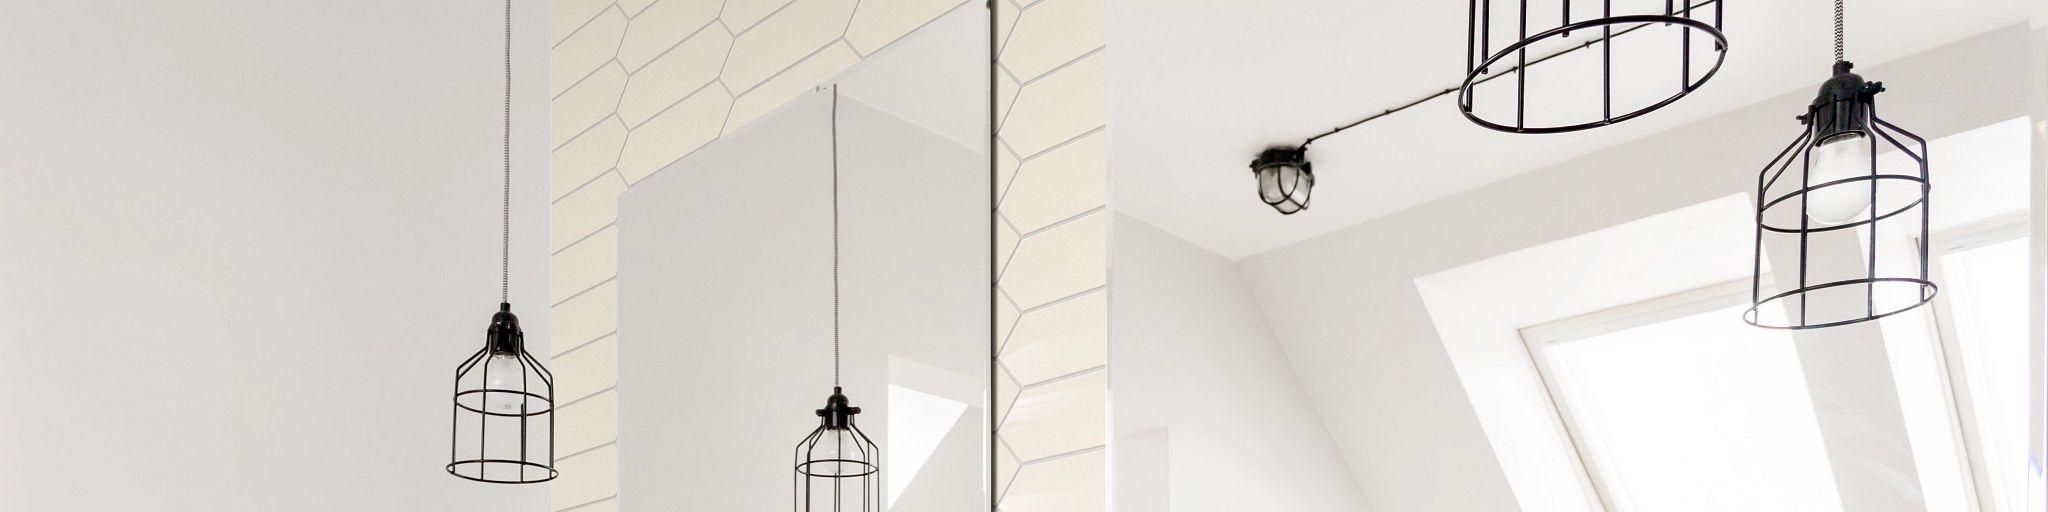 Tile-and-Stone-Backsplash-Cutlass-365TS-00120-Cream-3x12-Gloss-Bathroom-2020